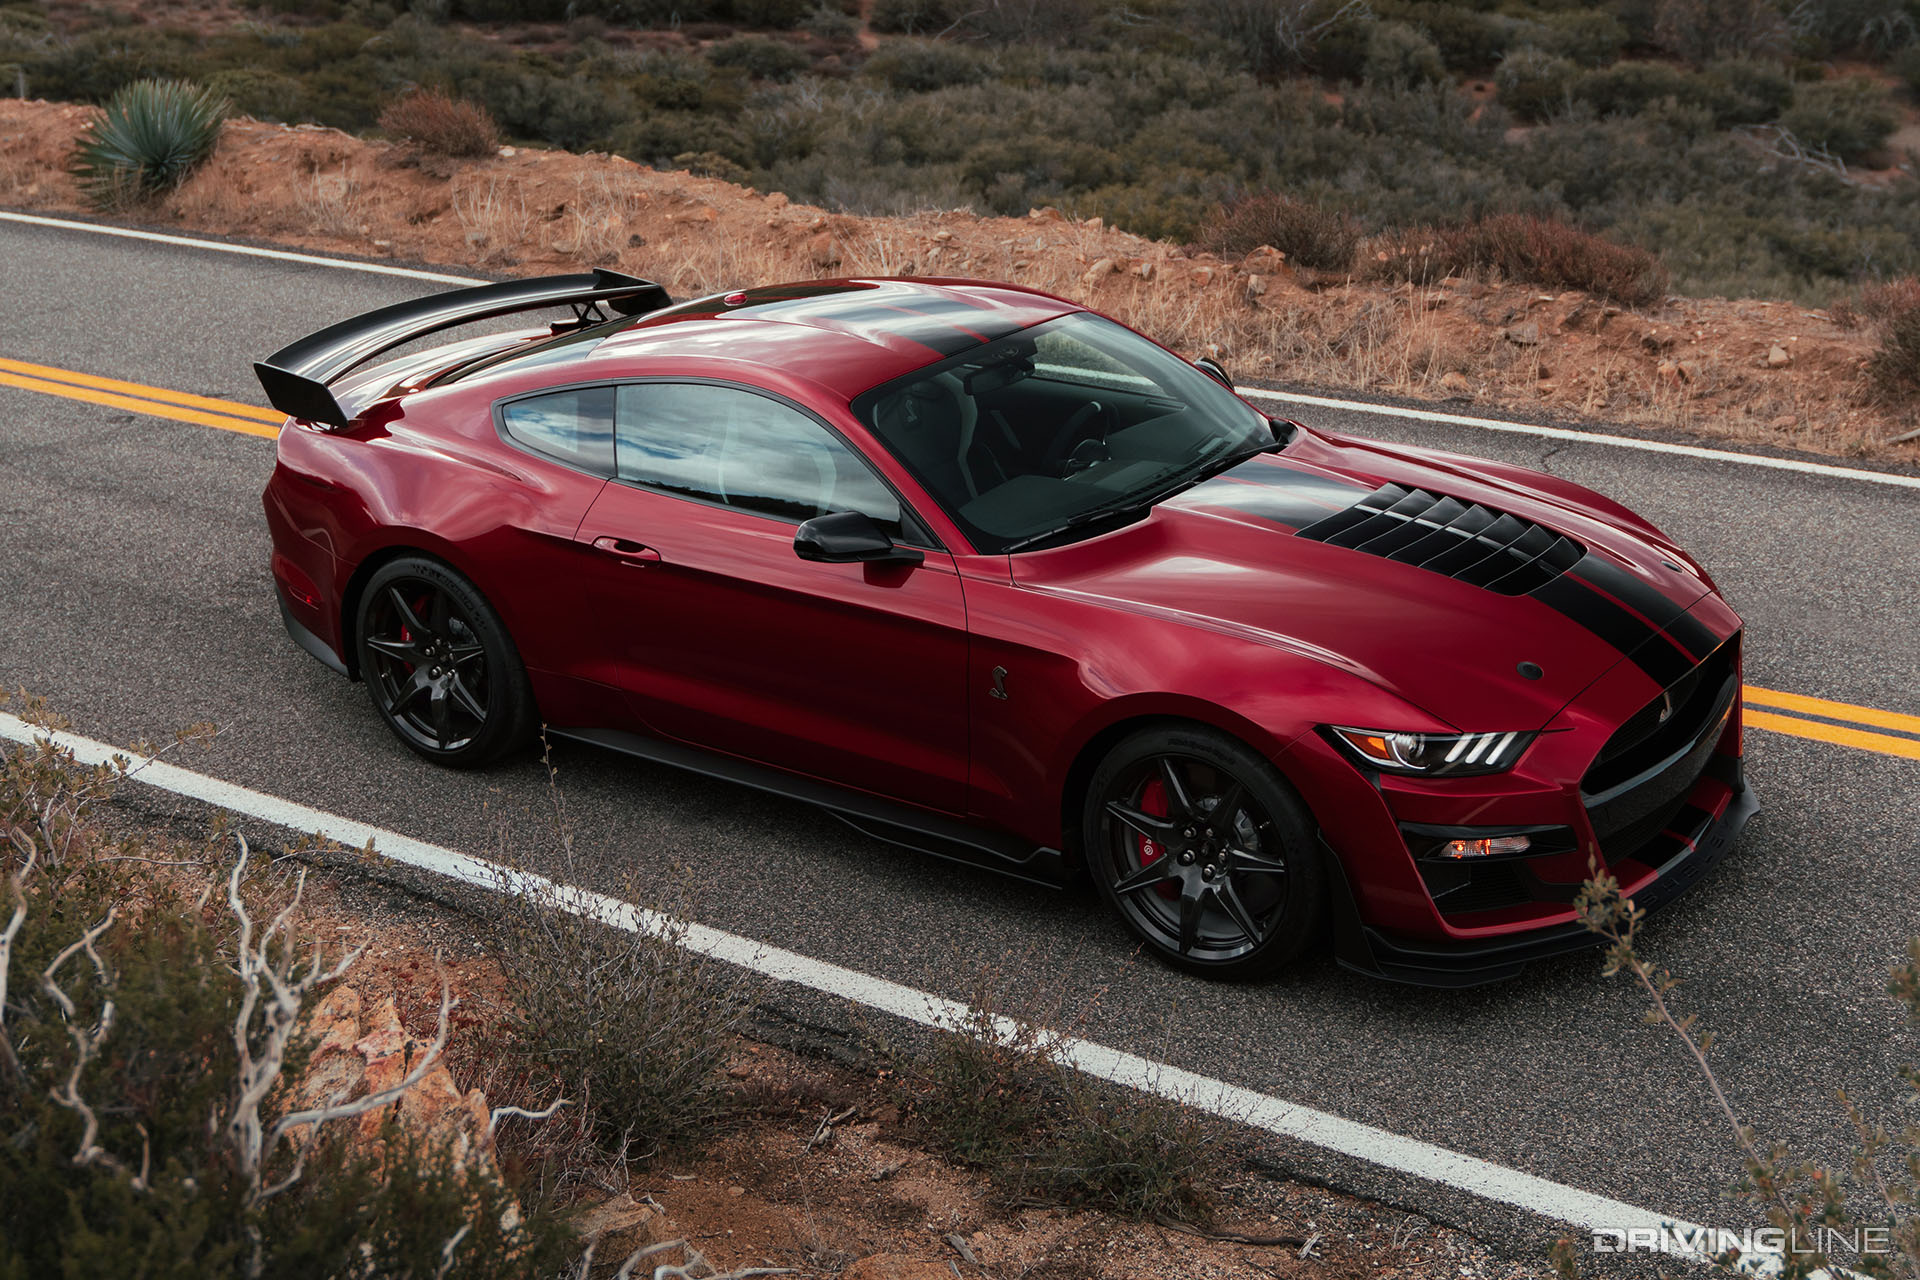 The Drivetrain Tech: 2020 Mustang Shelby GT500 | DrivingLine